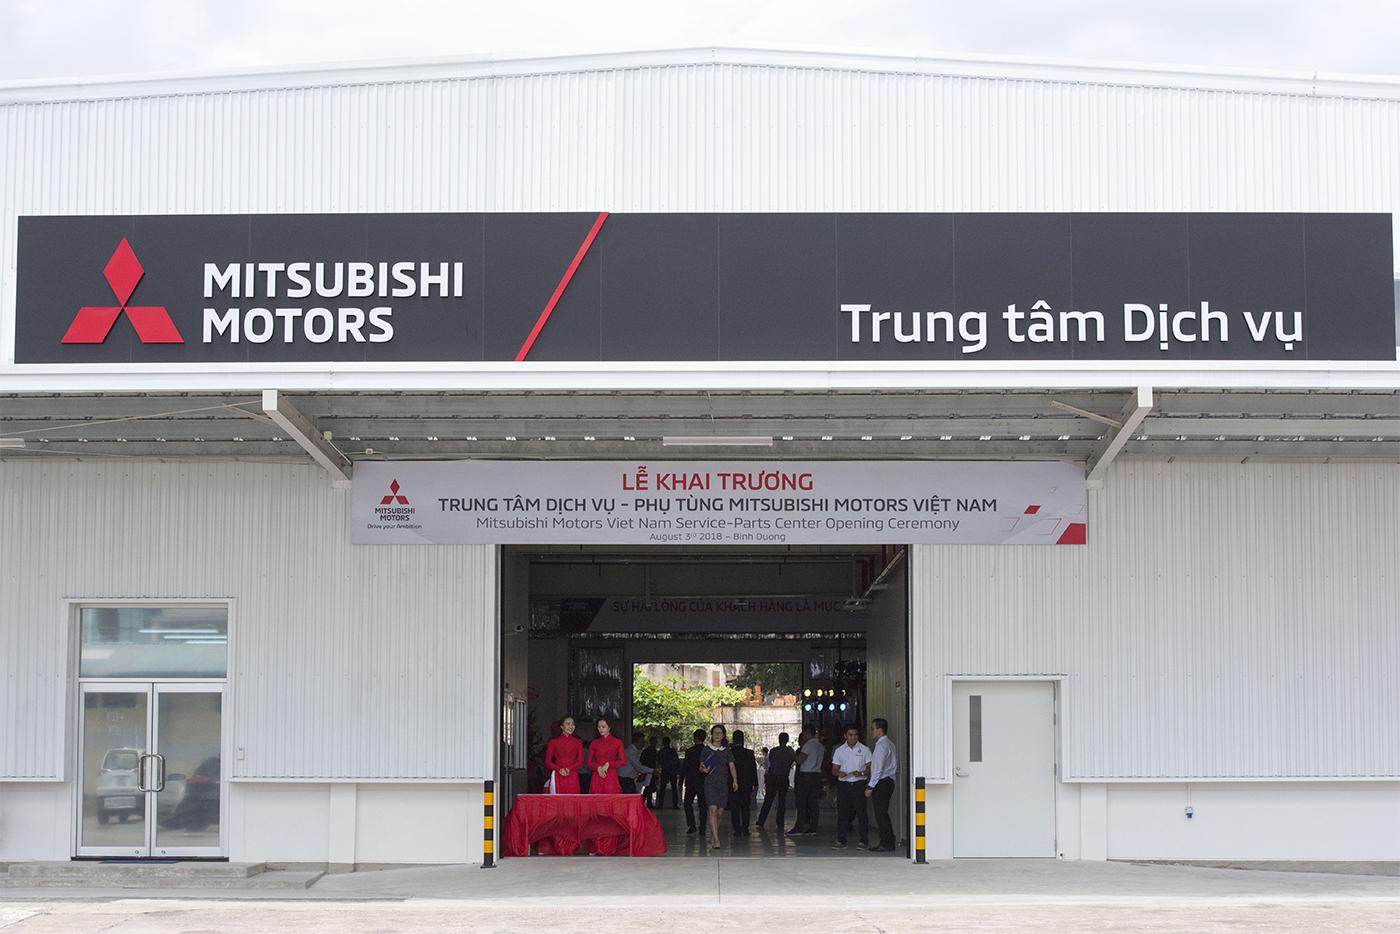 mitsubishi-motors-vietnam-4.jpg